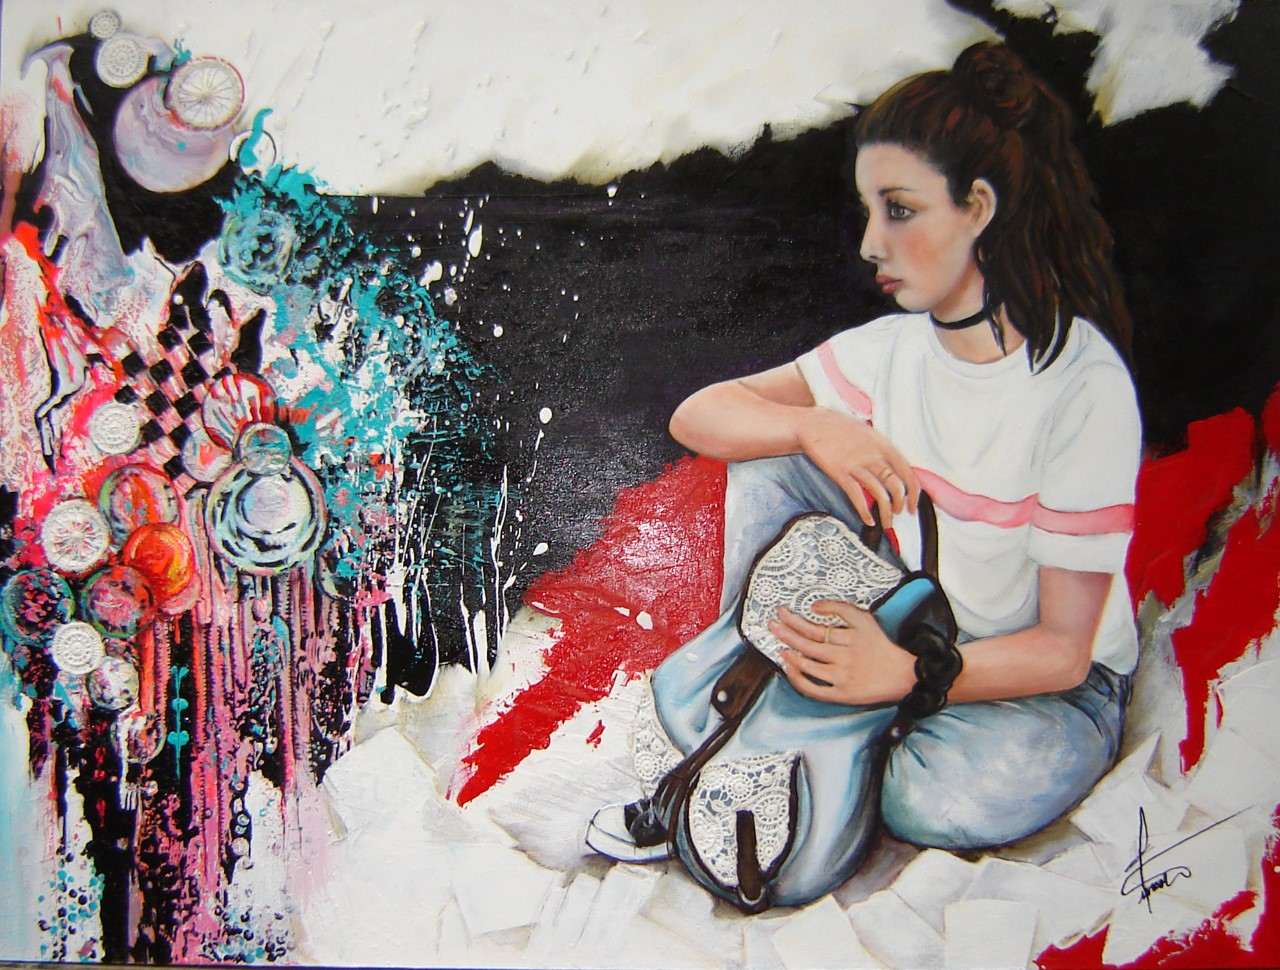 Denise_Turcotte_-_rêves_et_chimères